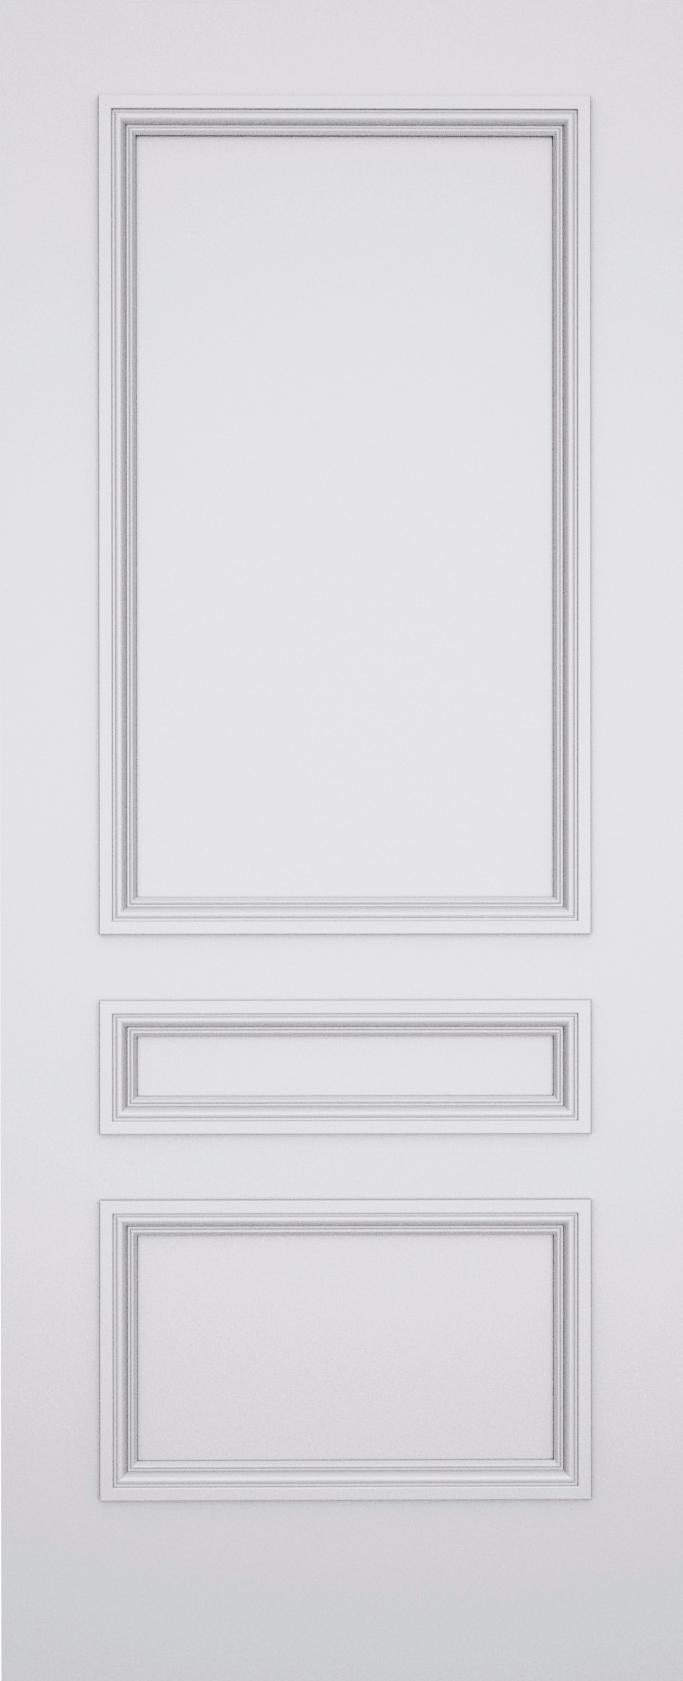 Kesh Balmoral 3 Panel Door